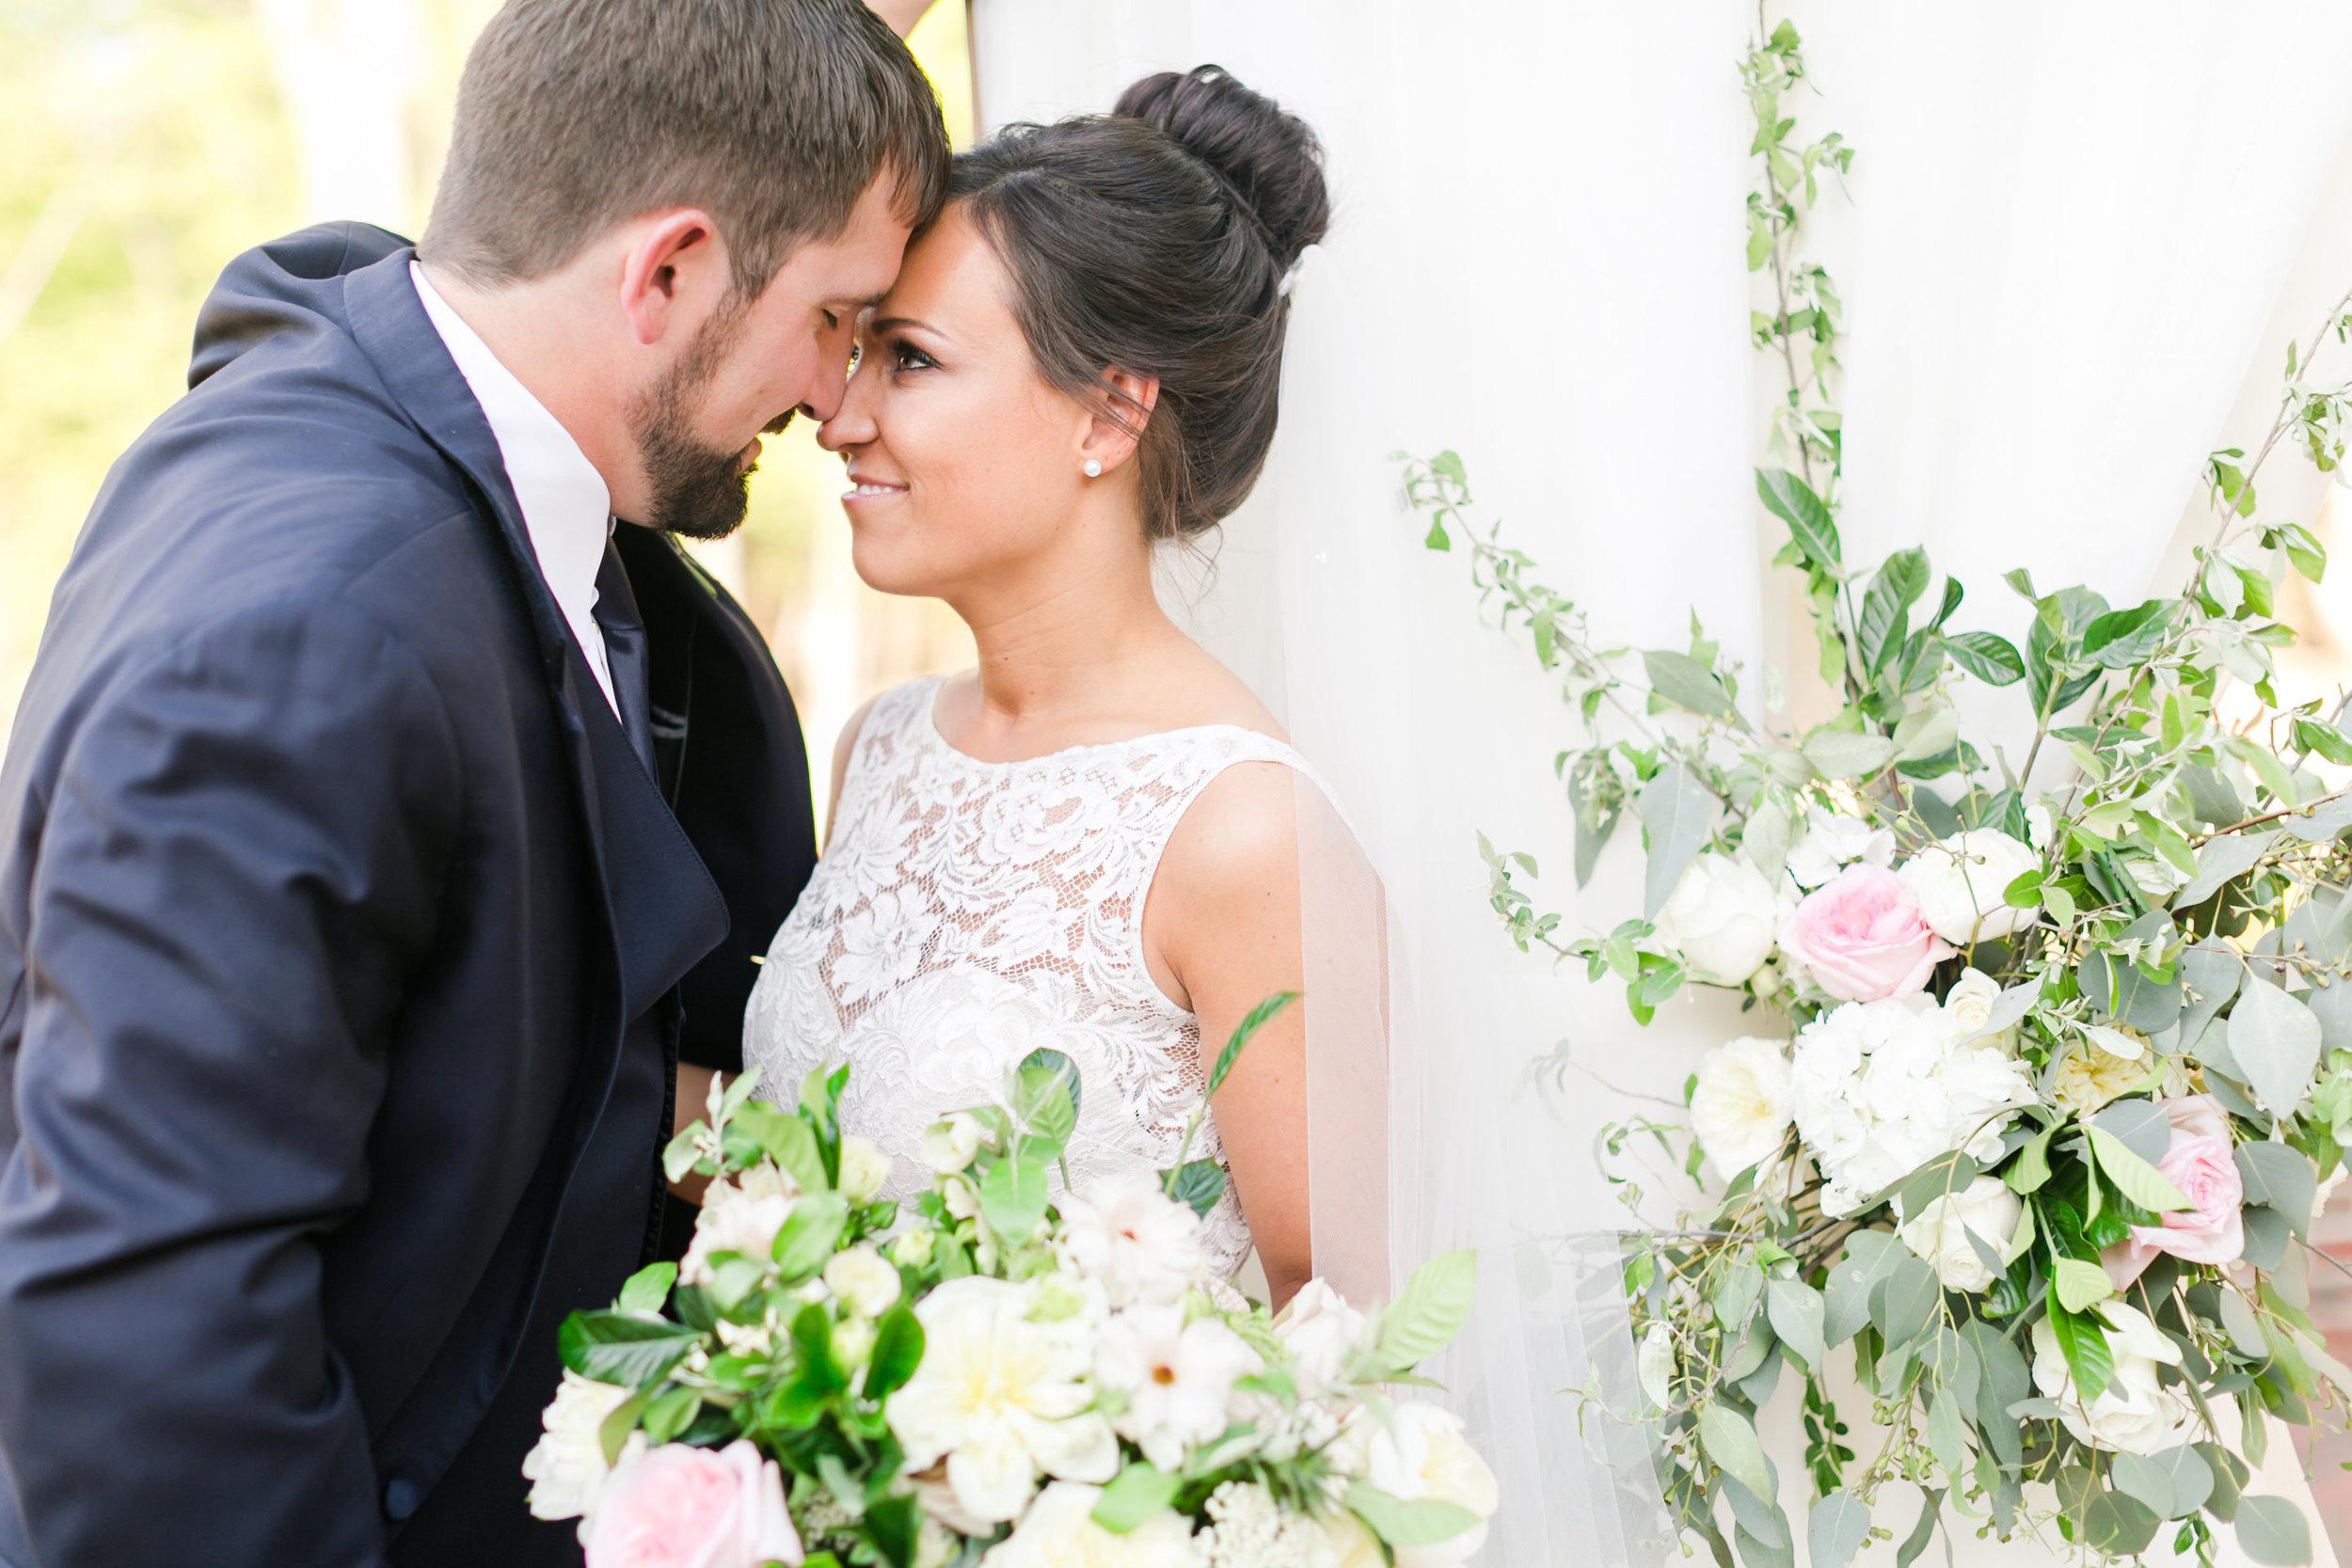 Alex Blair Wedding-Alex Blair Wedding 2-0025.jpg